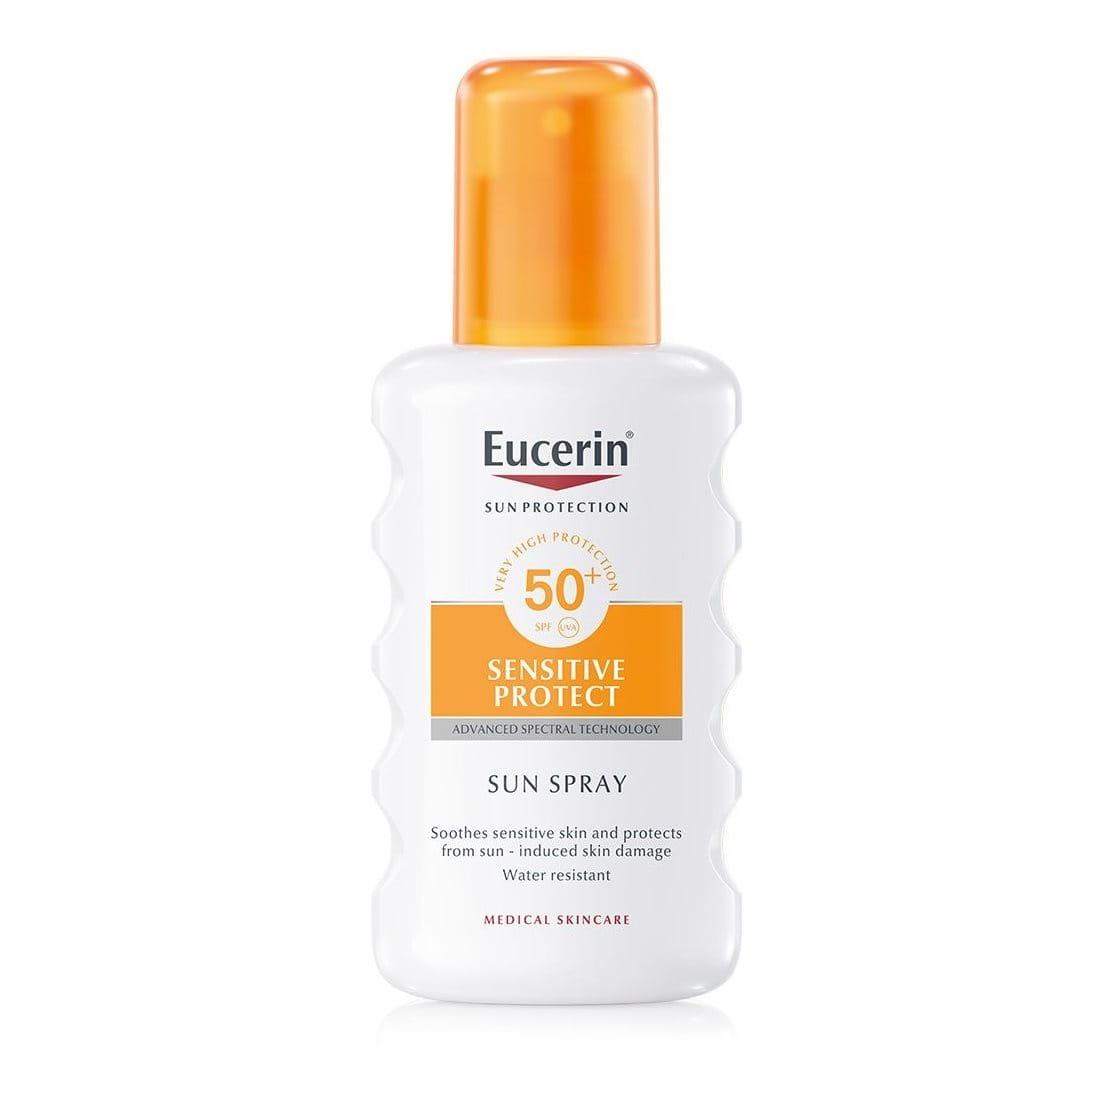 Eucerin Sun Spray Sensitive Protect SPF50+